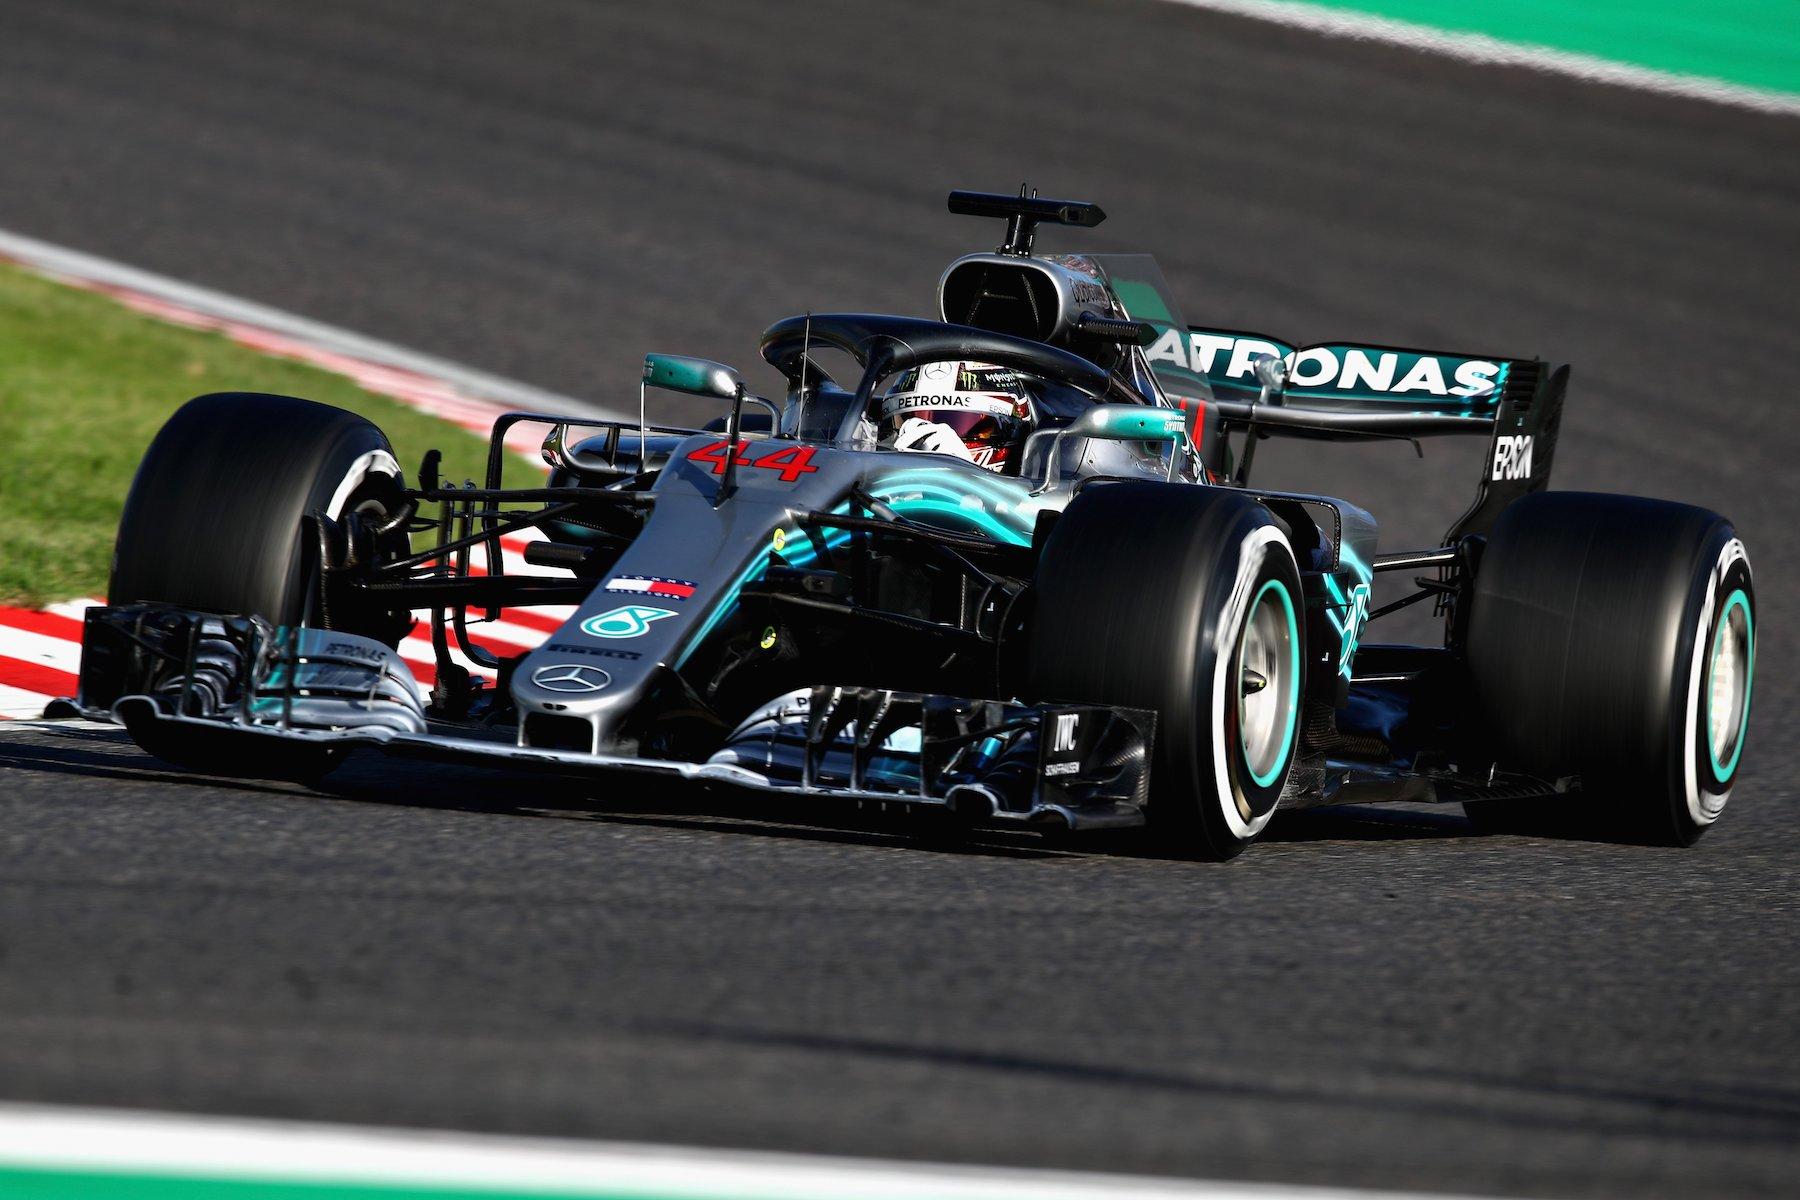 J 2018 Lewis Hamilton | Mercedes W09 | 2018 Japanese GP winner 1 copy.jpg